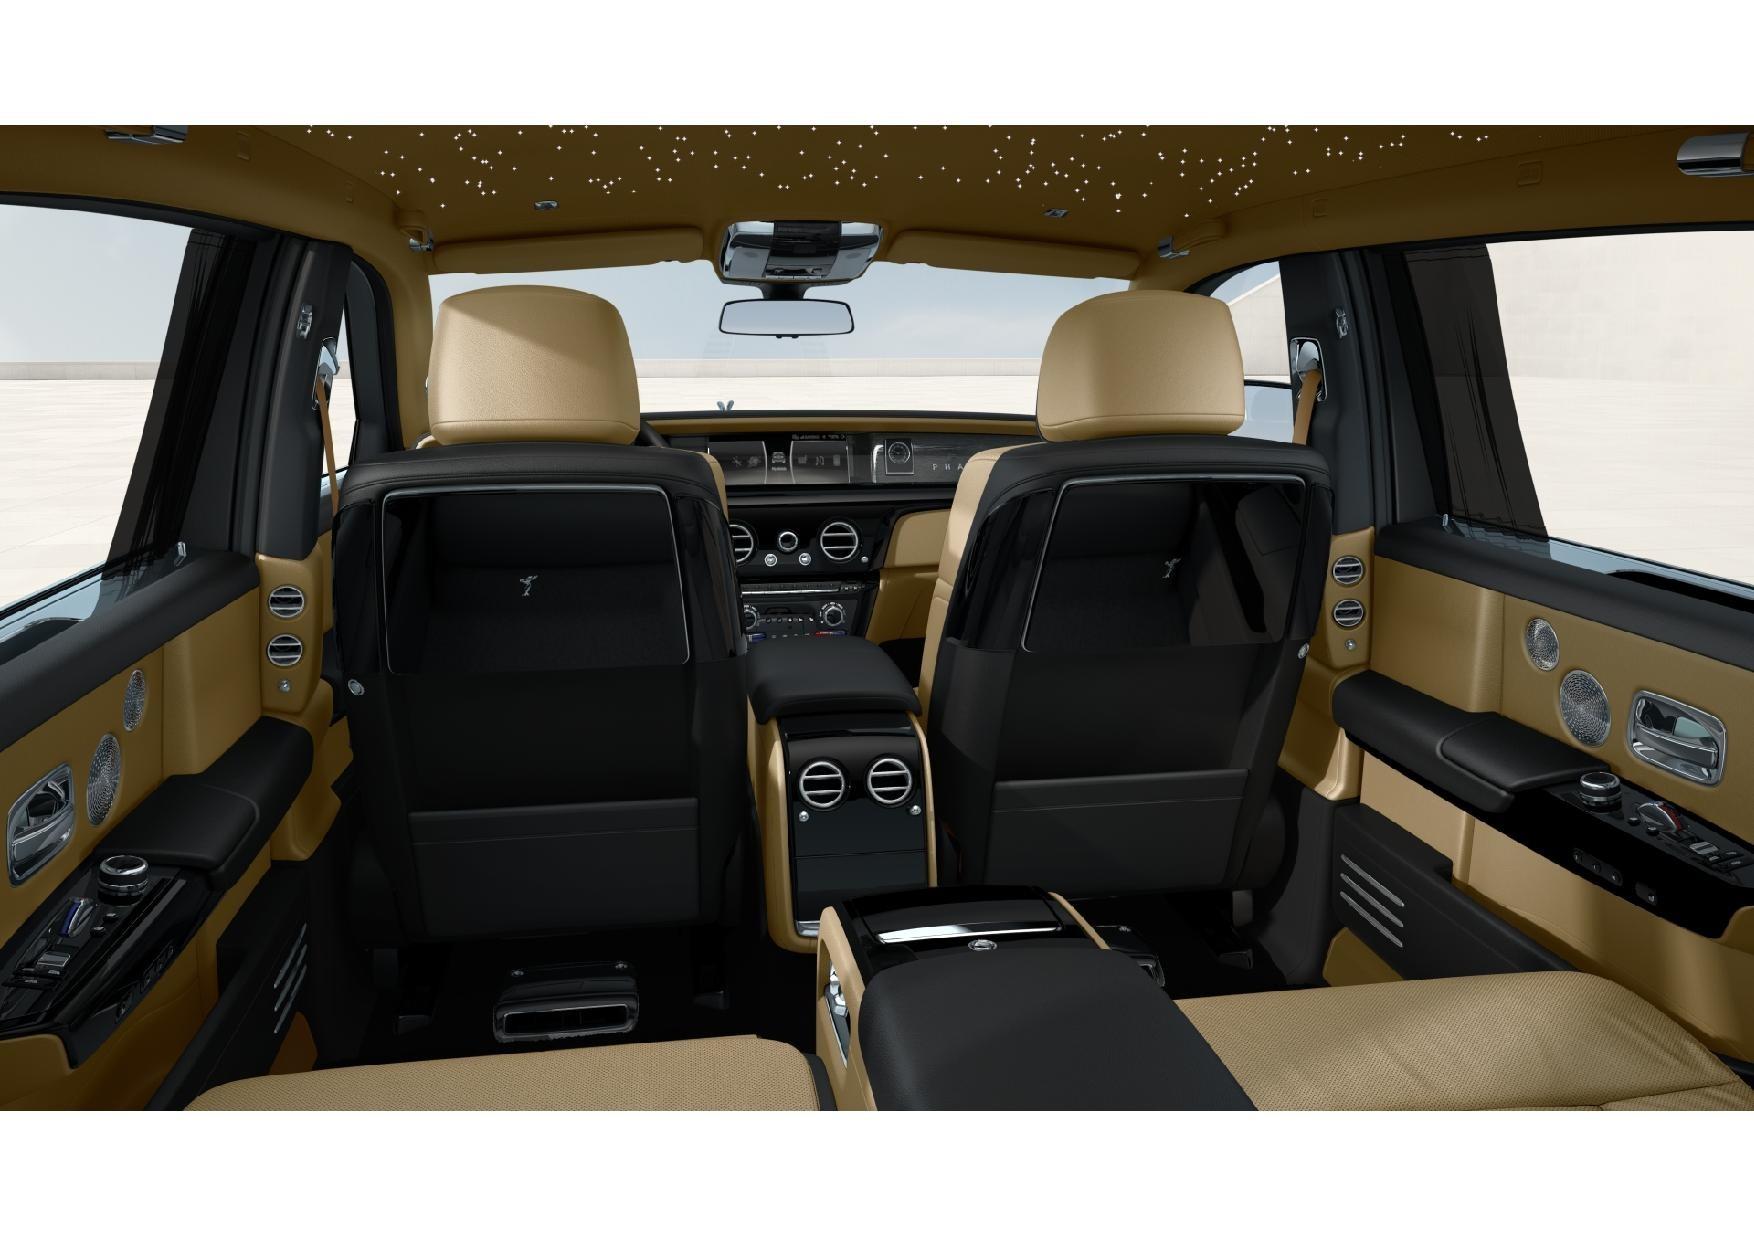 New 2022 Rolls Royce Phantom EWB